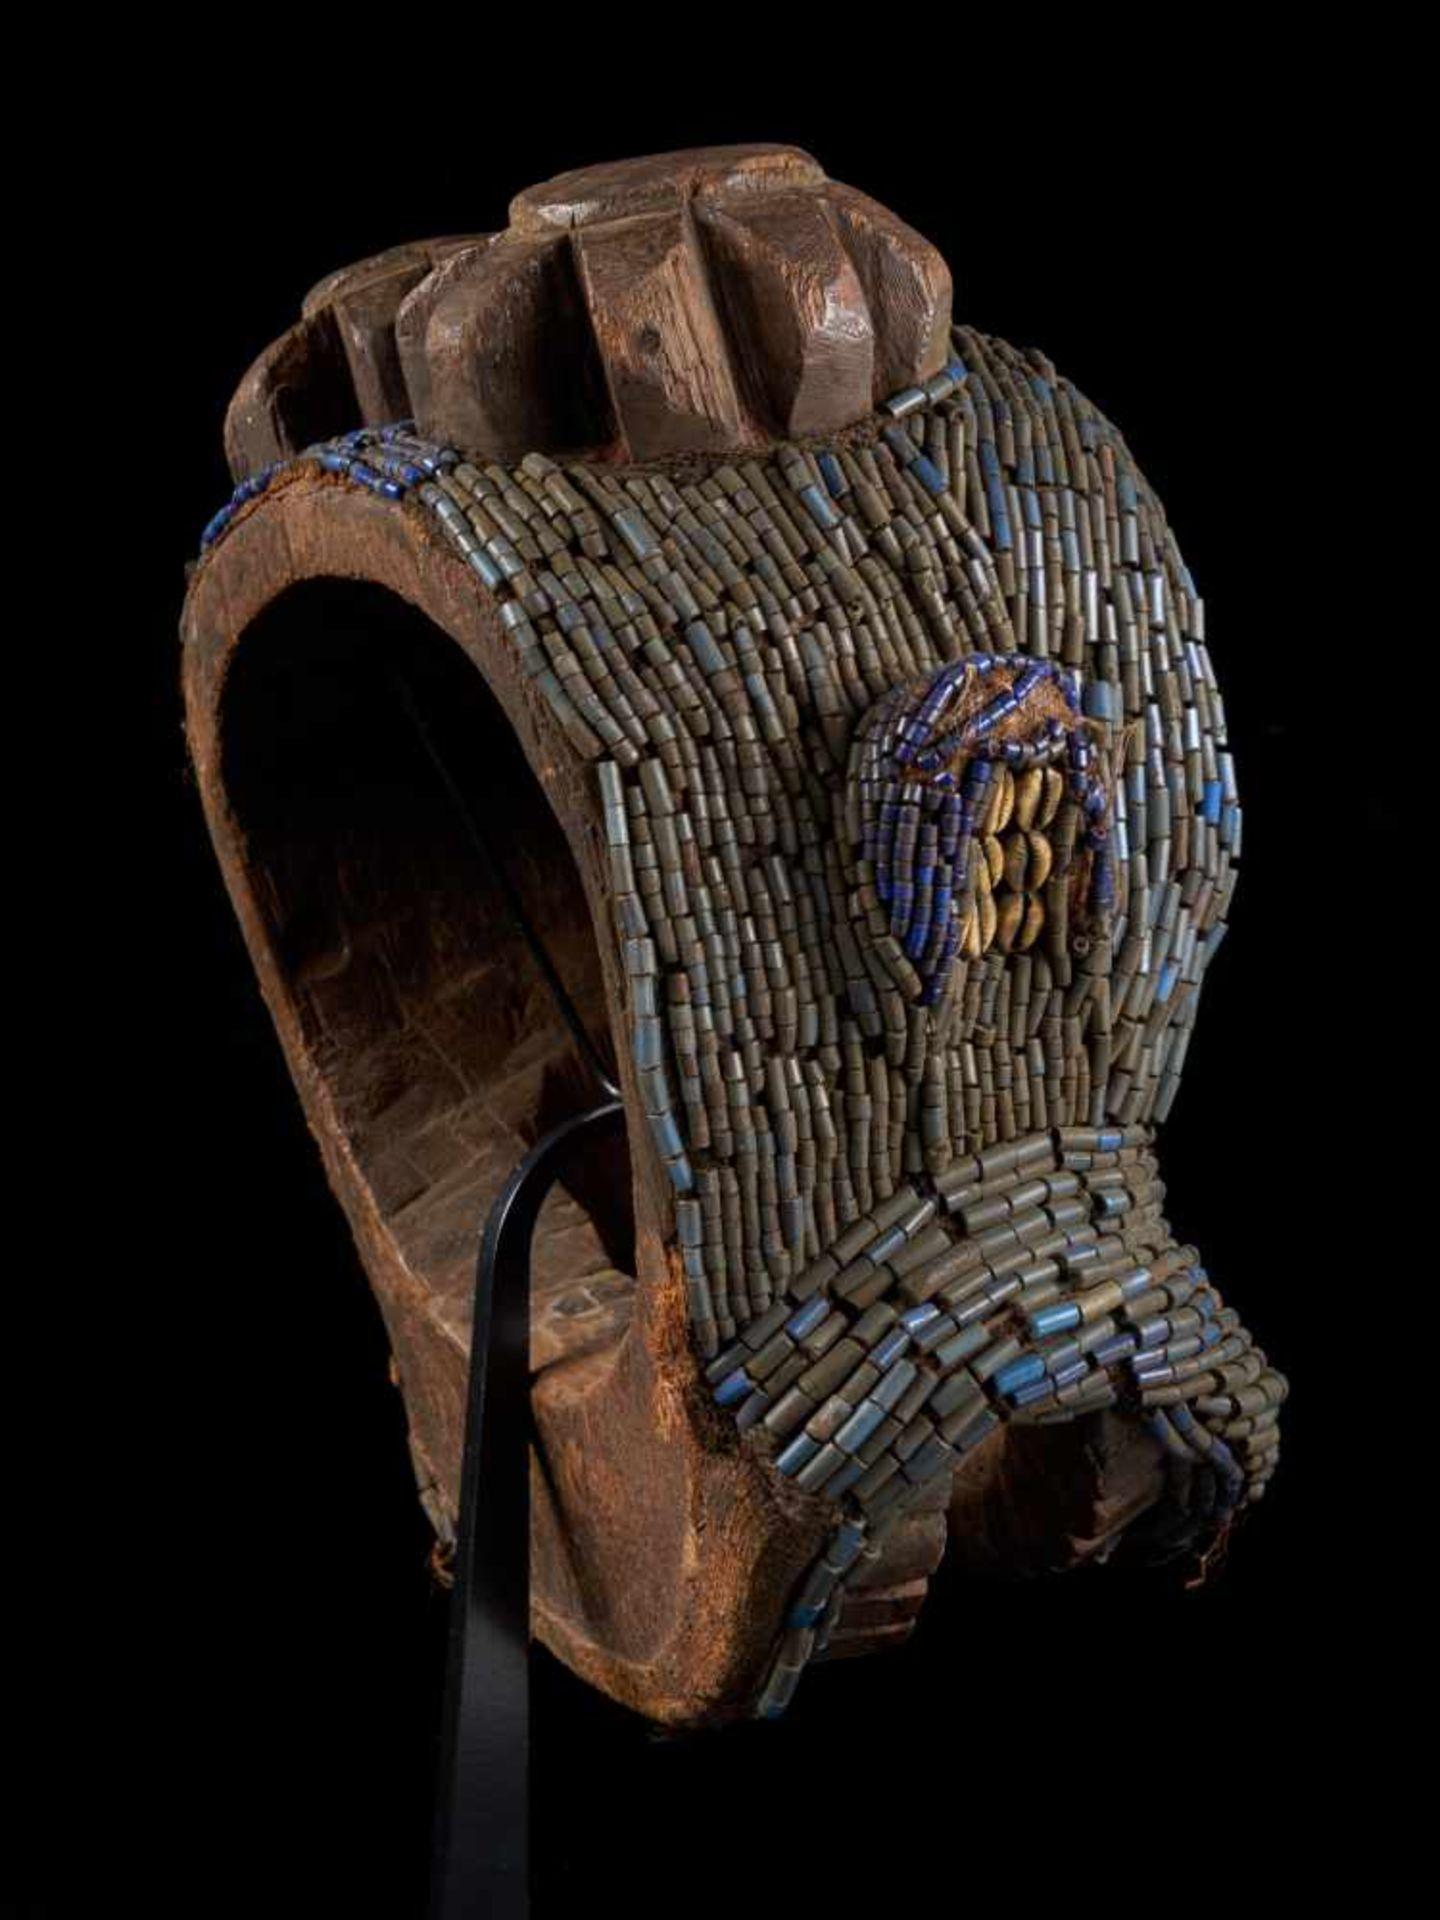 Beaded Gorilla Mask With Wooden Headdress - Tribal ArtA beautiful gorilla mask fashioned from wood - Bild 4 aus 7